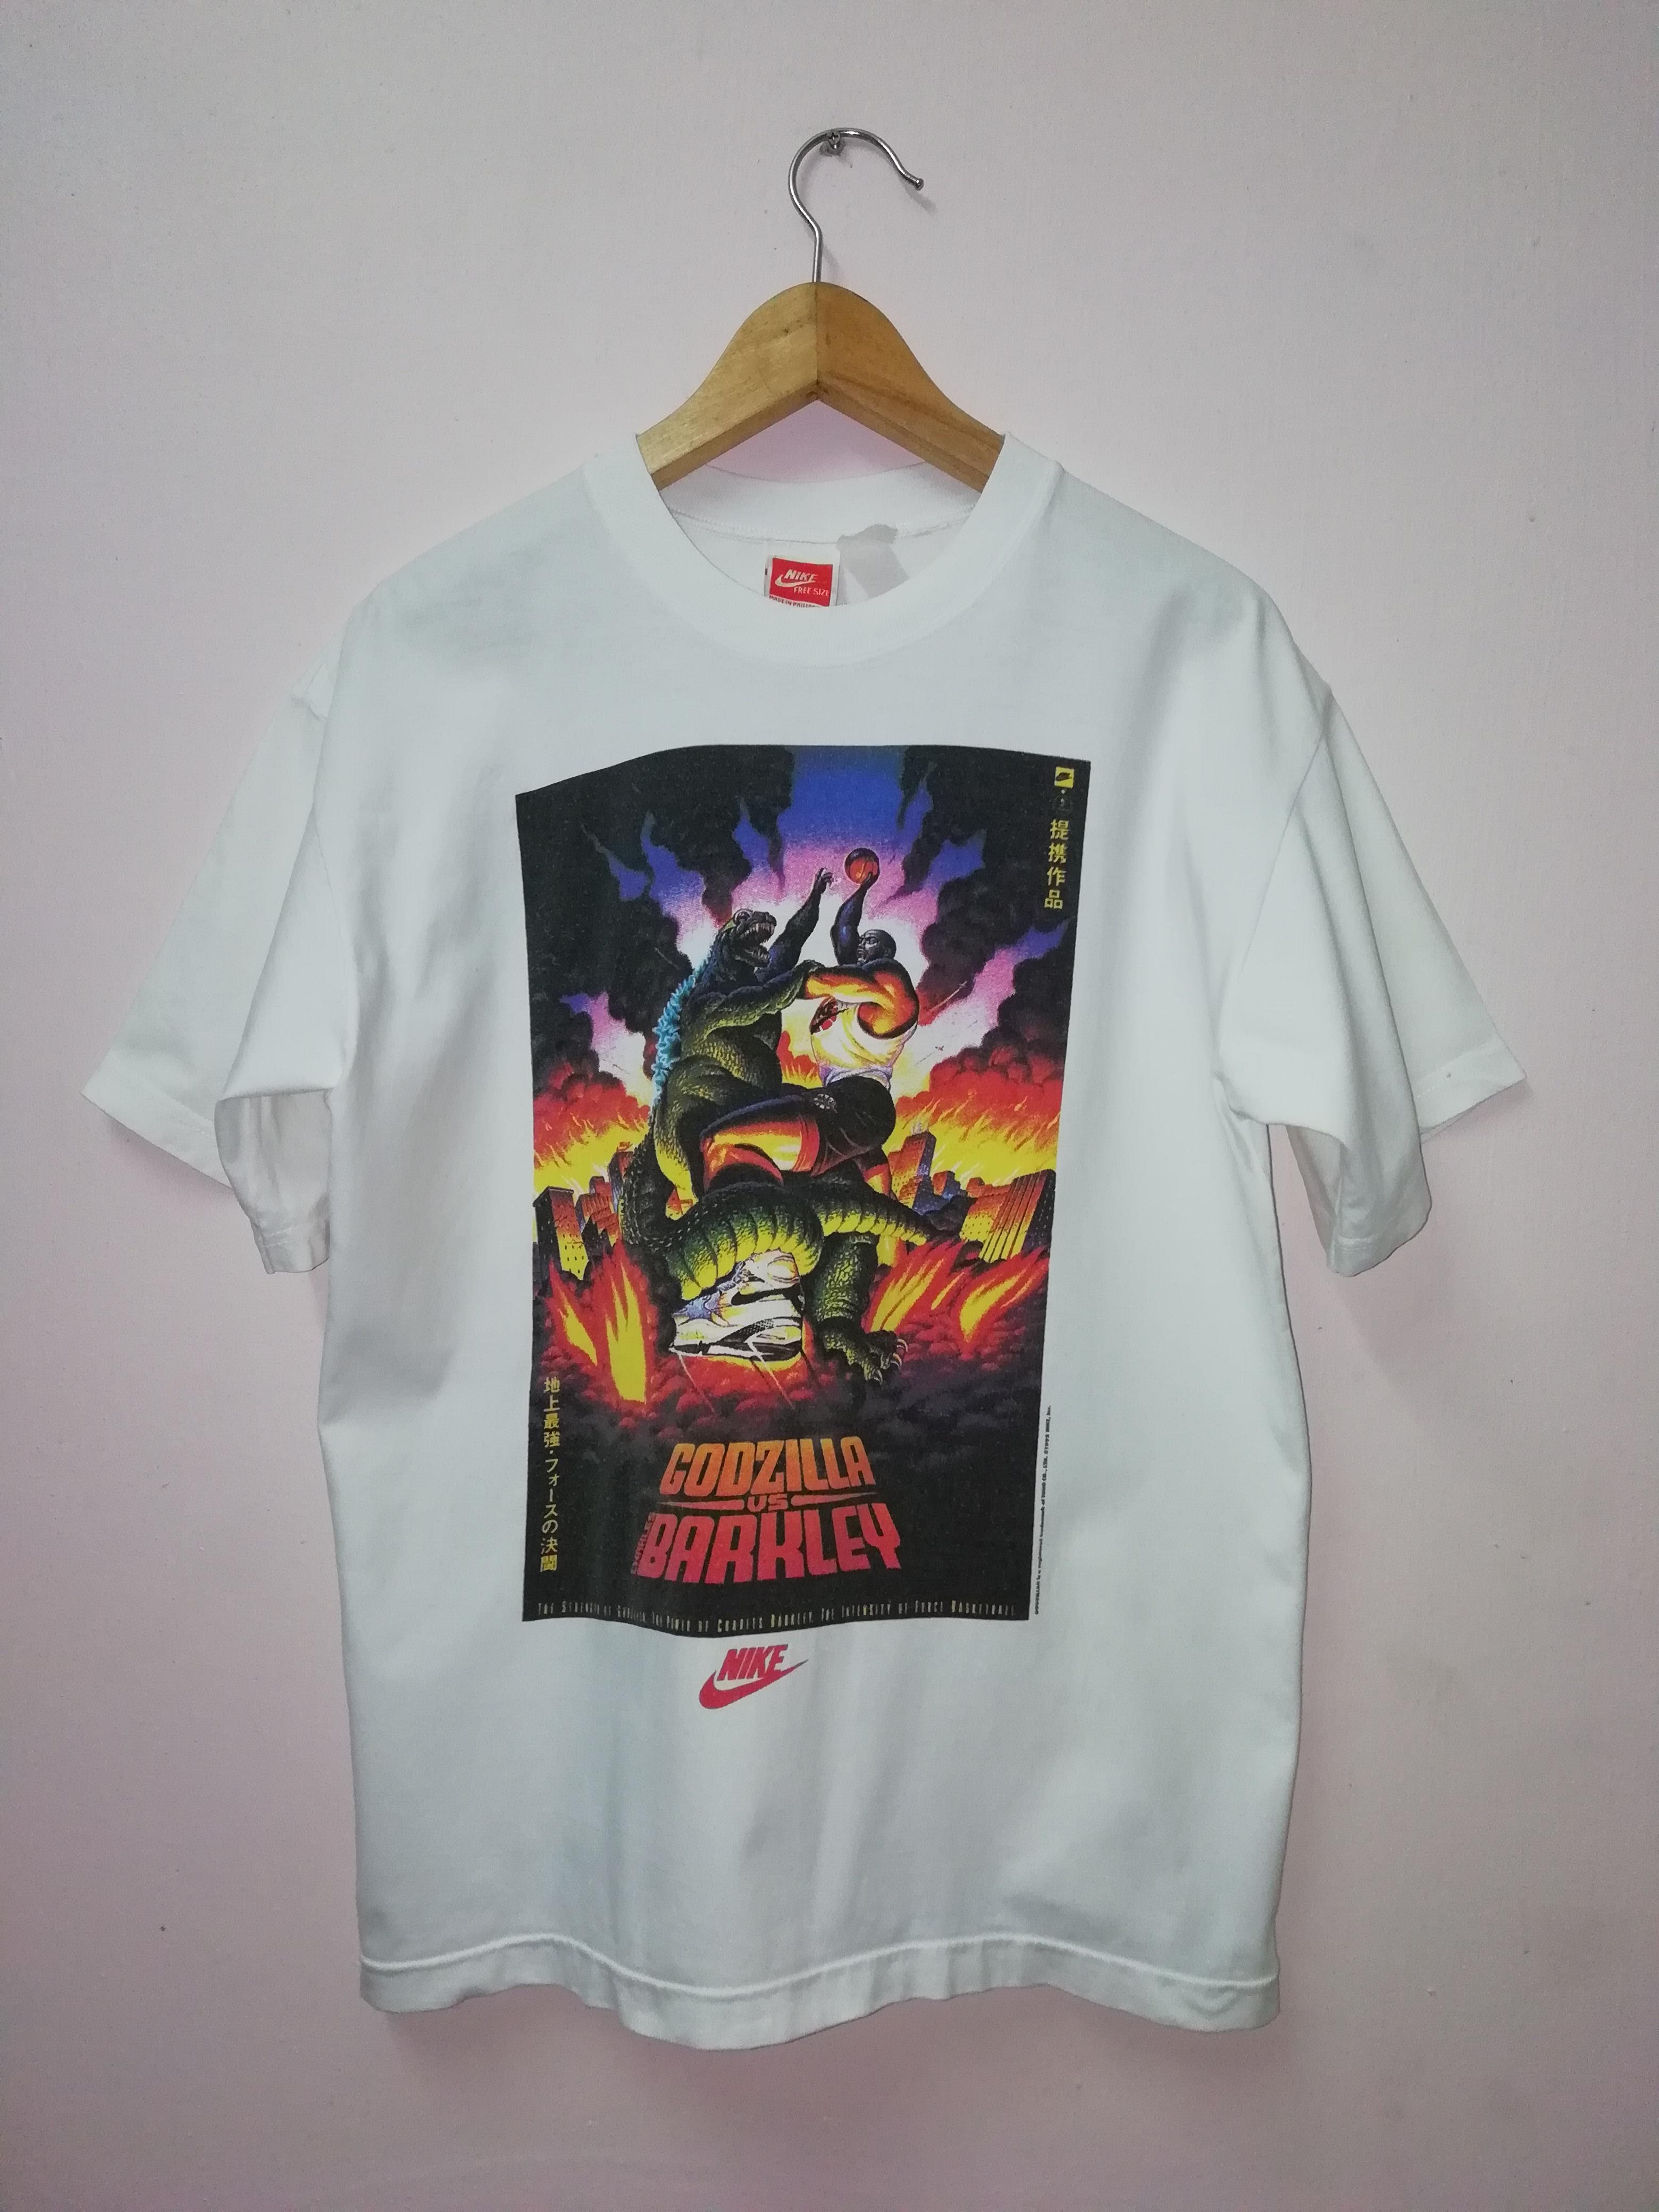 en stock 7e6e2 e6bcd Vintage 1992 Nike Godzilla vs Barkley T-Shirt